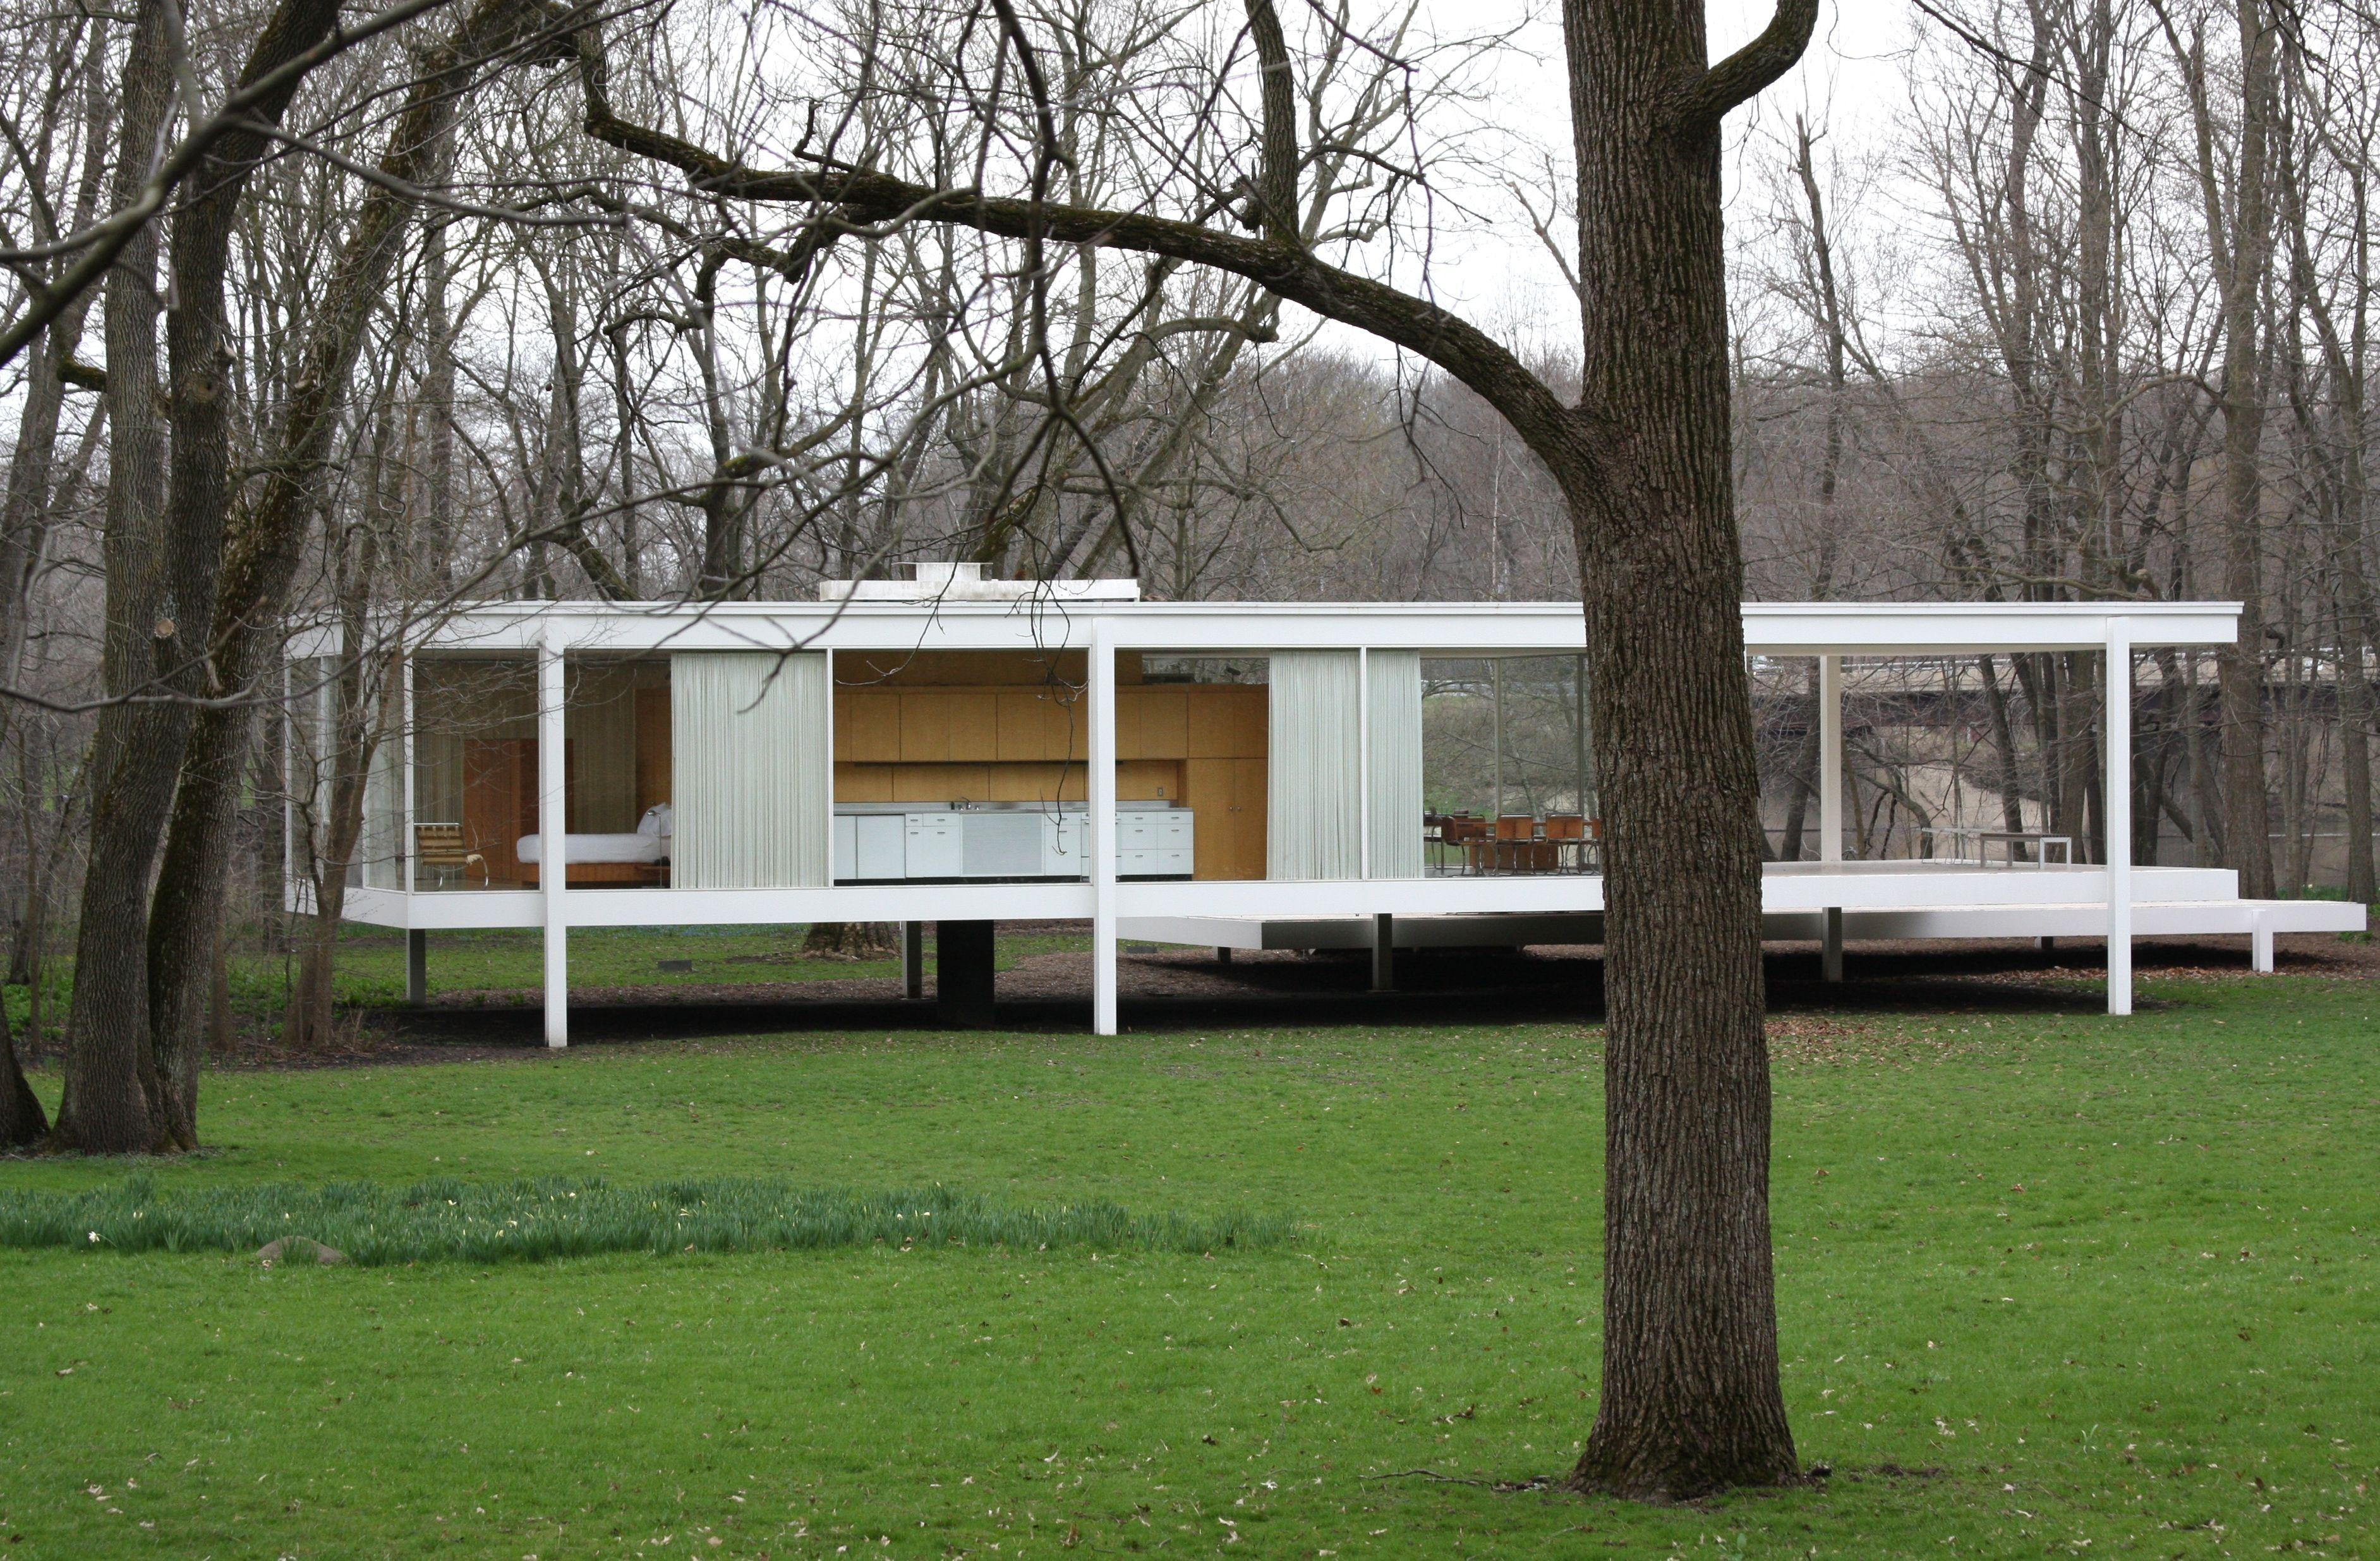 Farnsworth House Ludwig Mies Der Rohe farnsworth house ludwig mies der rohe 45 51 e